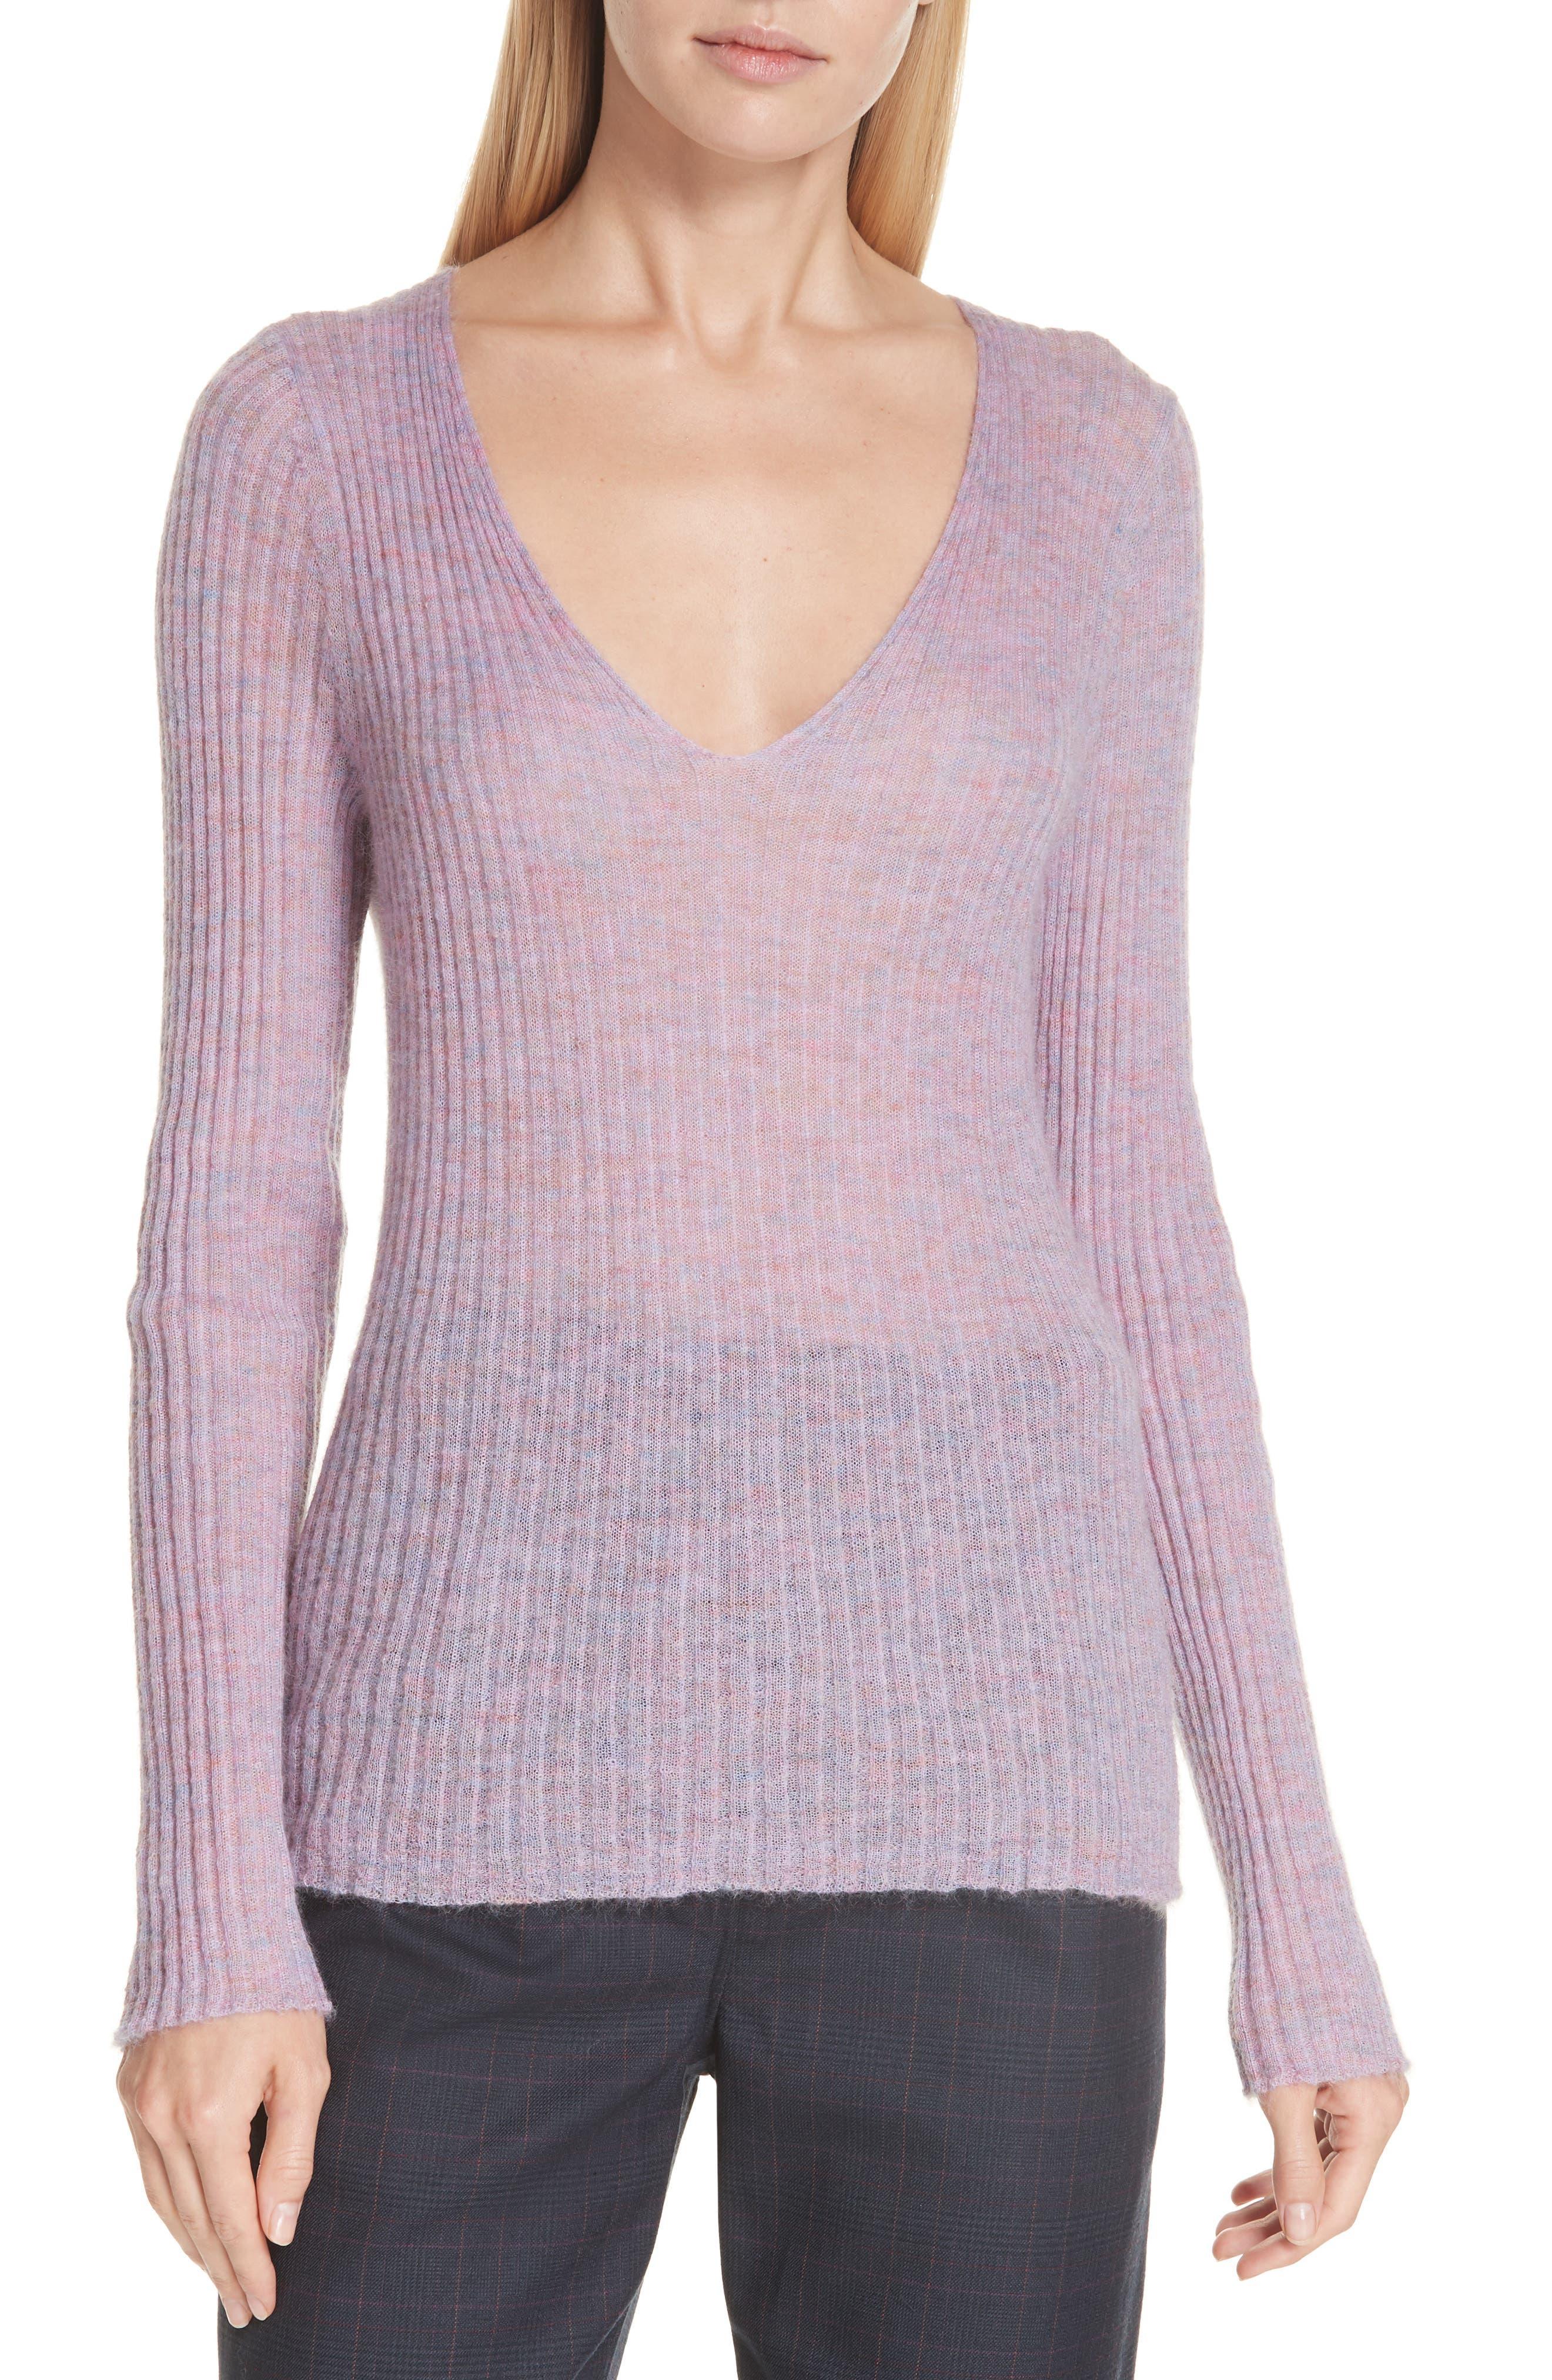 RAG & BONE, Donna Mohair Blend Sweater, Main thumbnail 1, color, LILAC